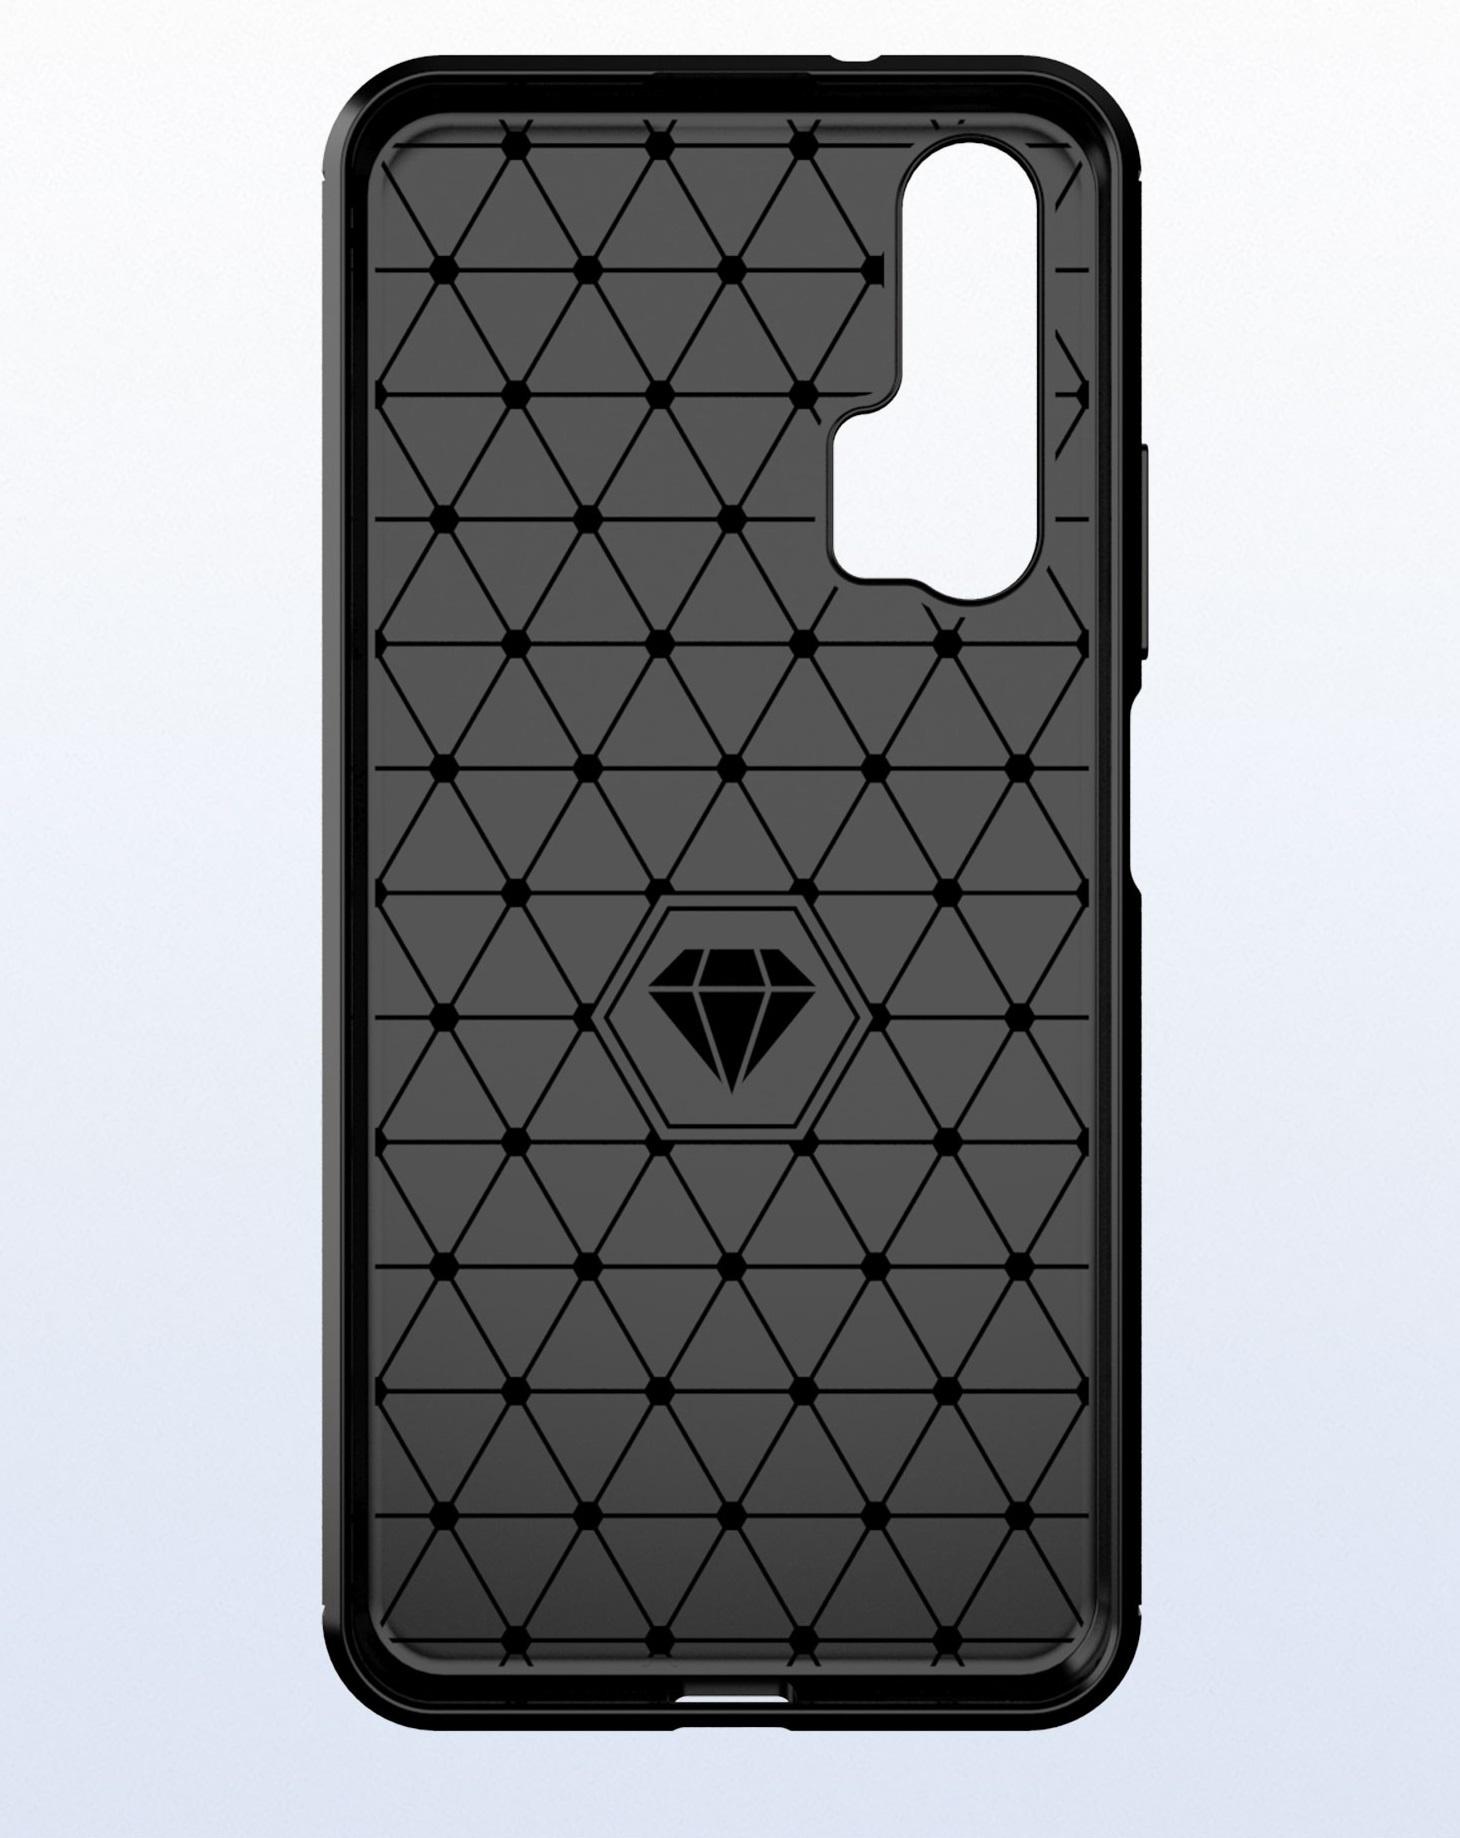 Чехол для Honor 20 (Honor 20S, 20 Pro, Huawei Nova 5T) цвет Gray (серый), серия Carbon от Caseport